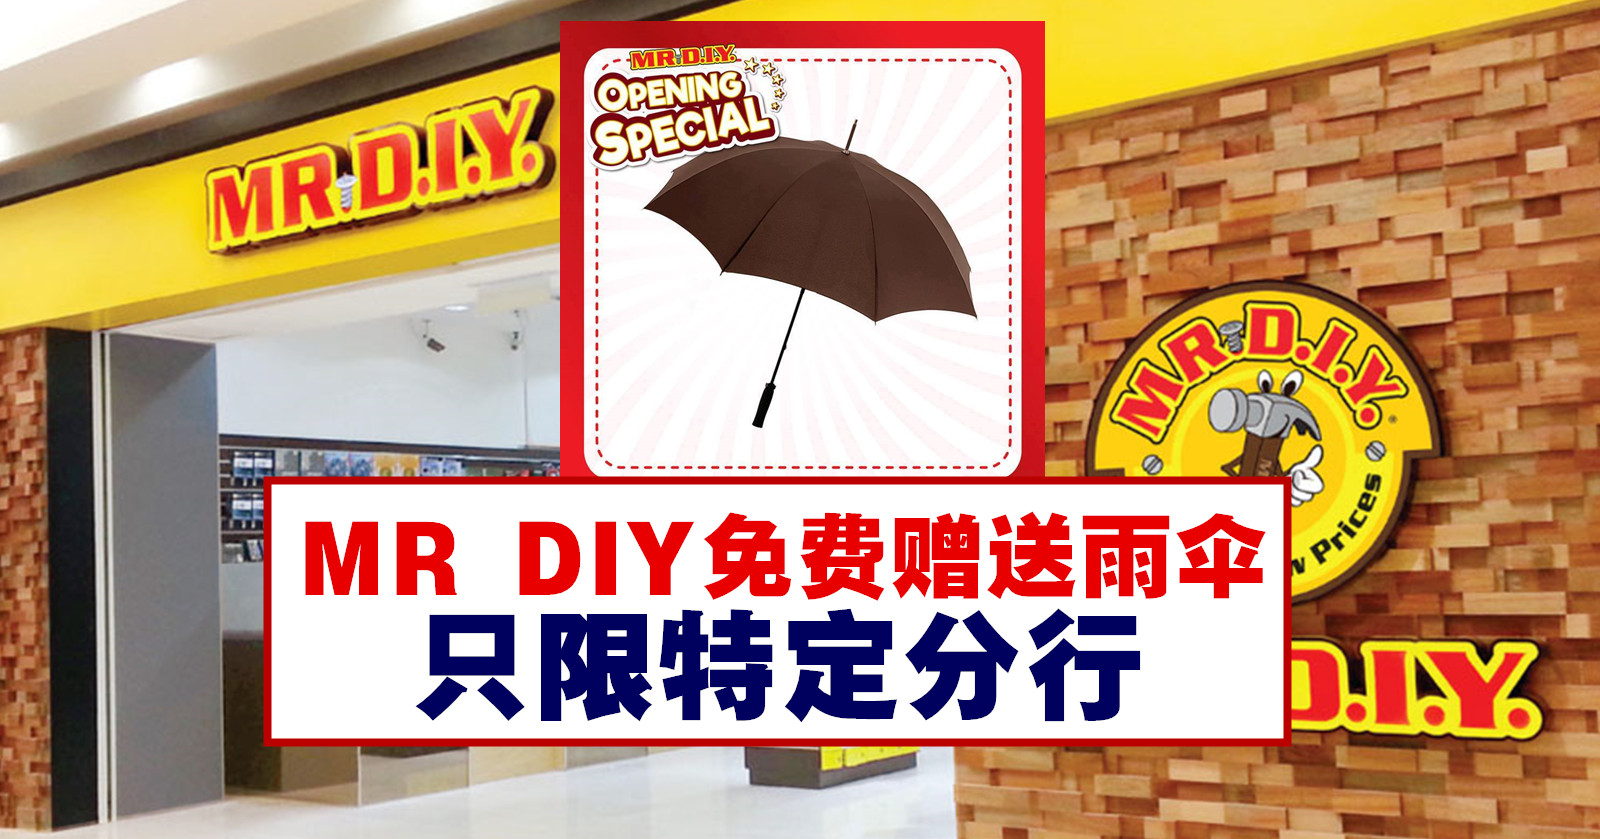 MR DIY开张优惠,免费送雨伞